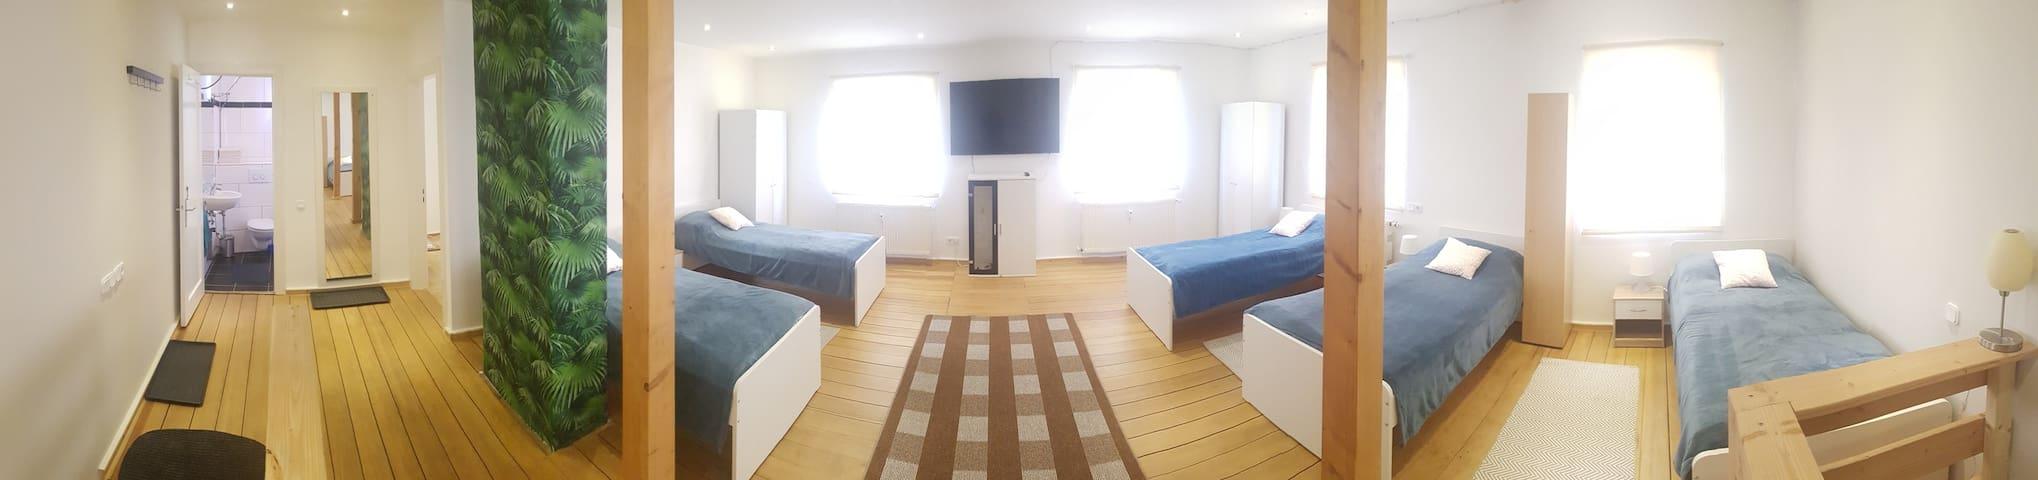 FloorOne - Amazing Apartment,Cozy & Central 5beds